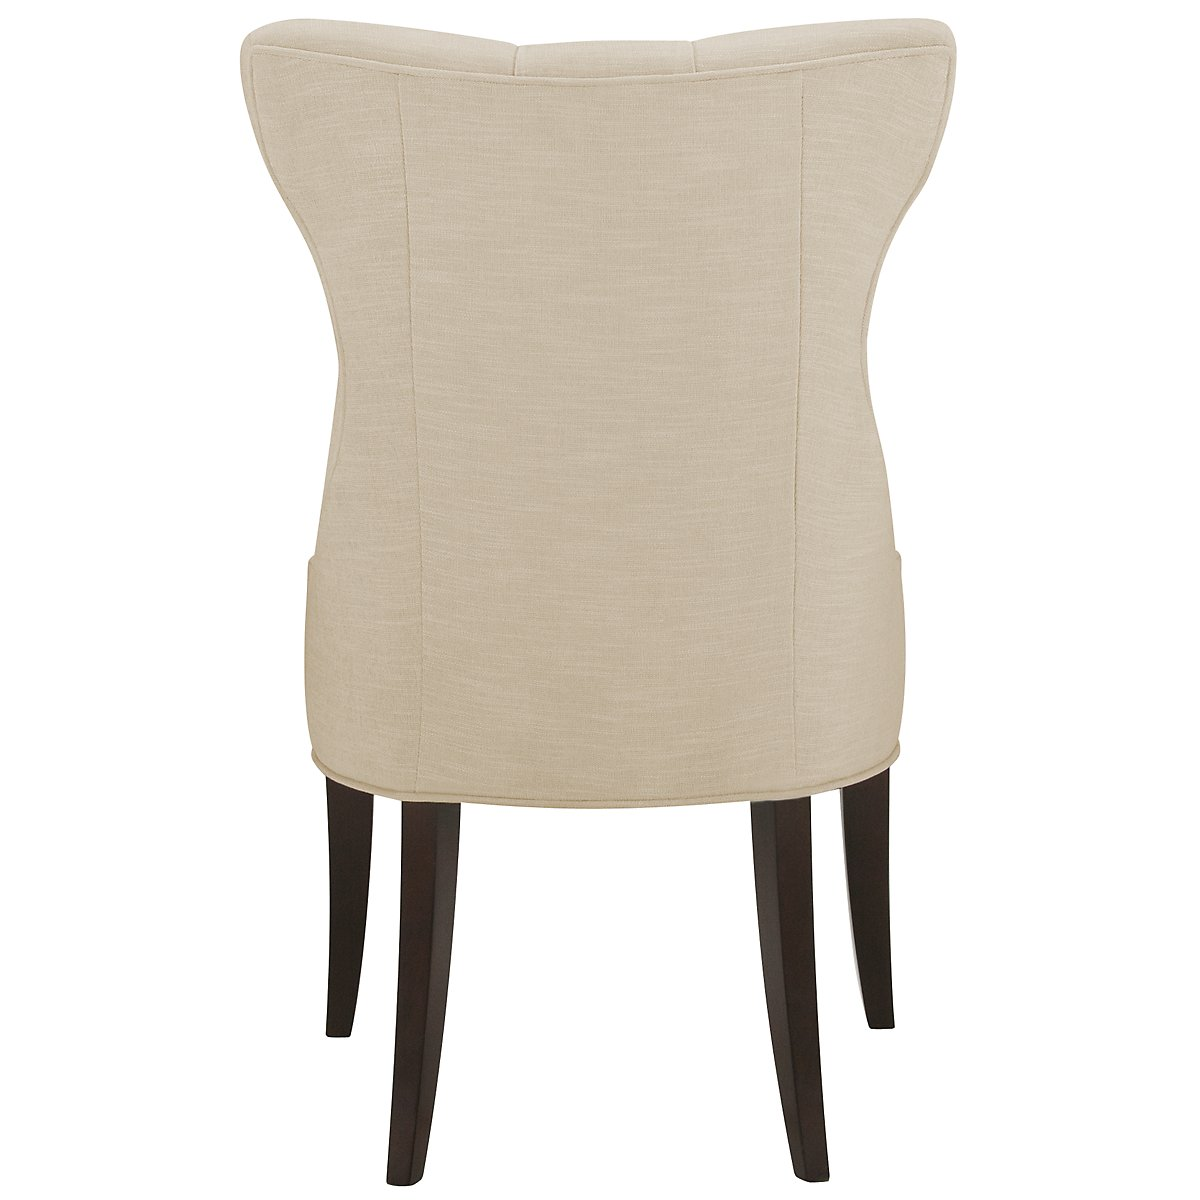 Deco Light Beige Upholstered Side Chair